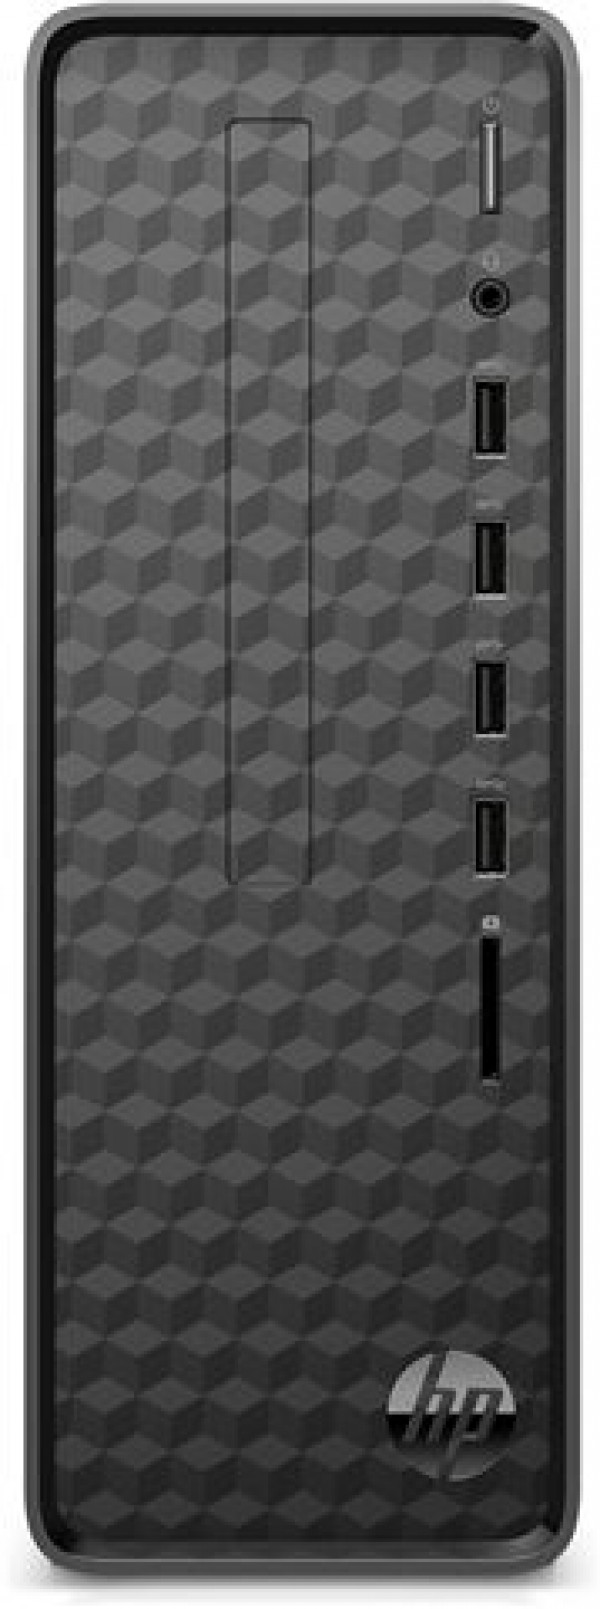 HP DES slim S01-pF0007ny i5-9400 4G256, 107G1EA